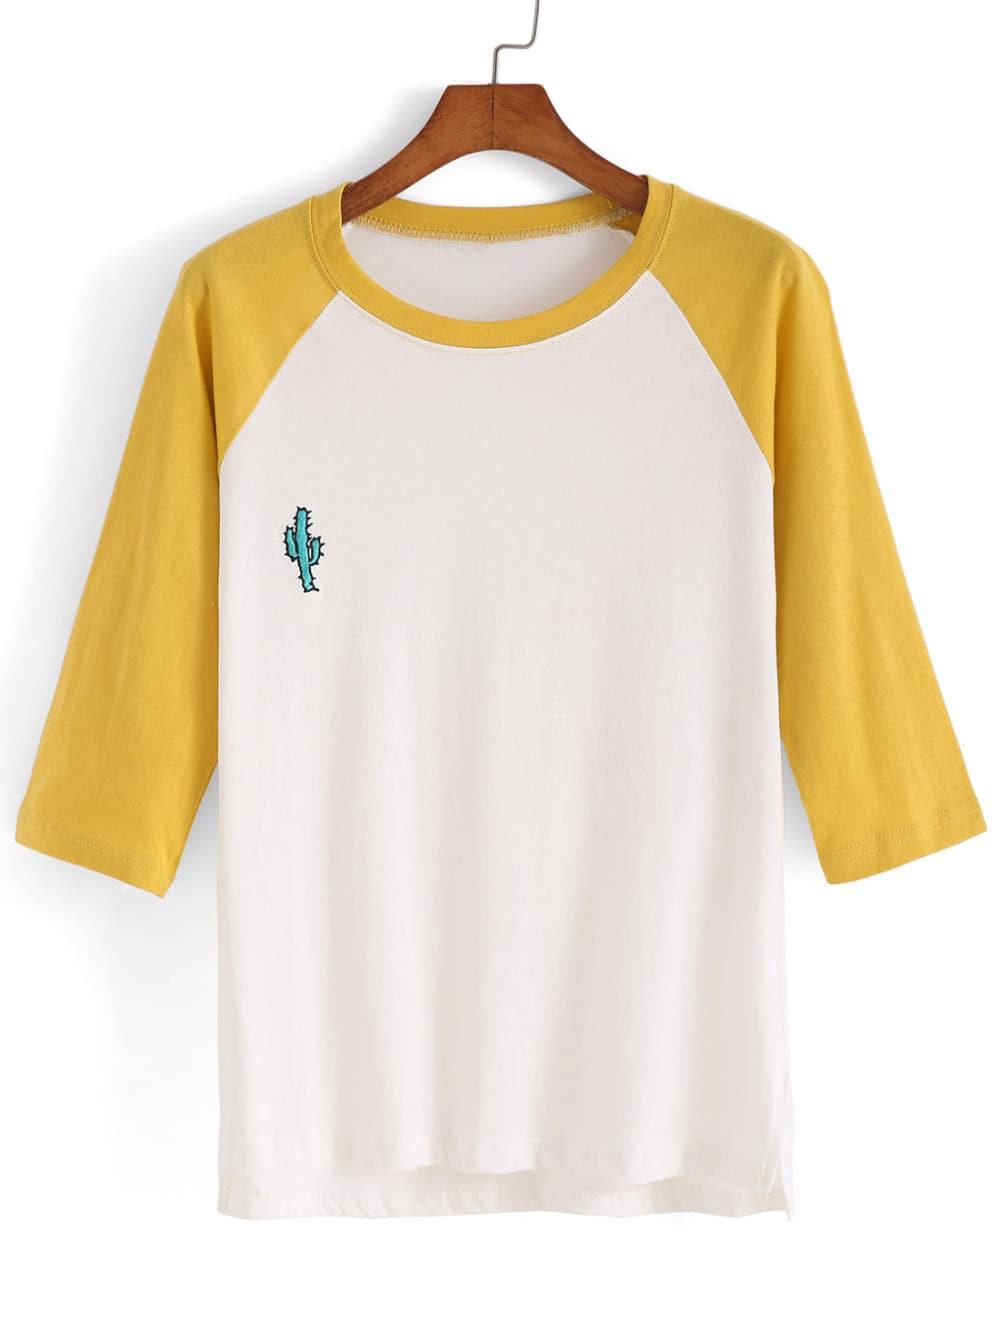 Dip Hem Color-block Embroidered T-shirtDip Hem Color-block Embroidered T-shirt<br><br>color: Multi<br>size: one-size